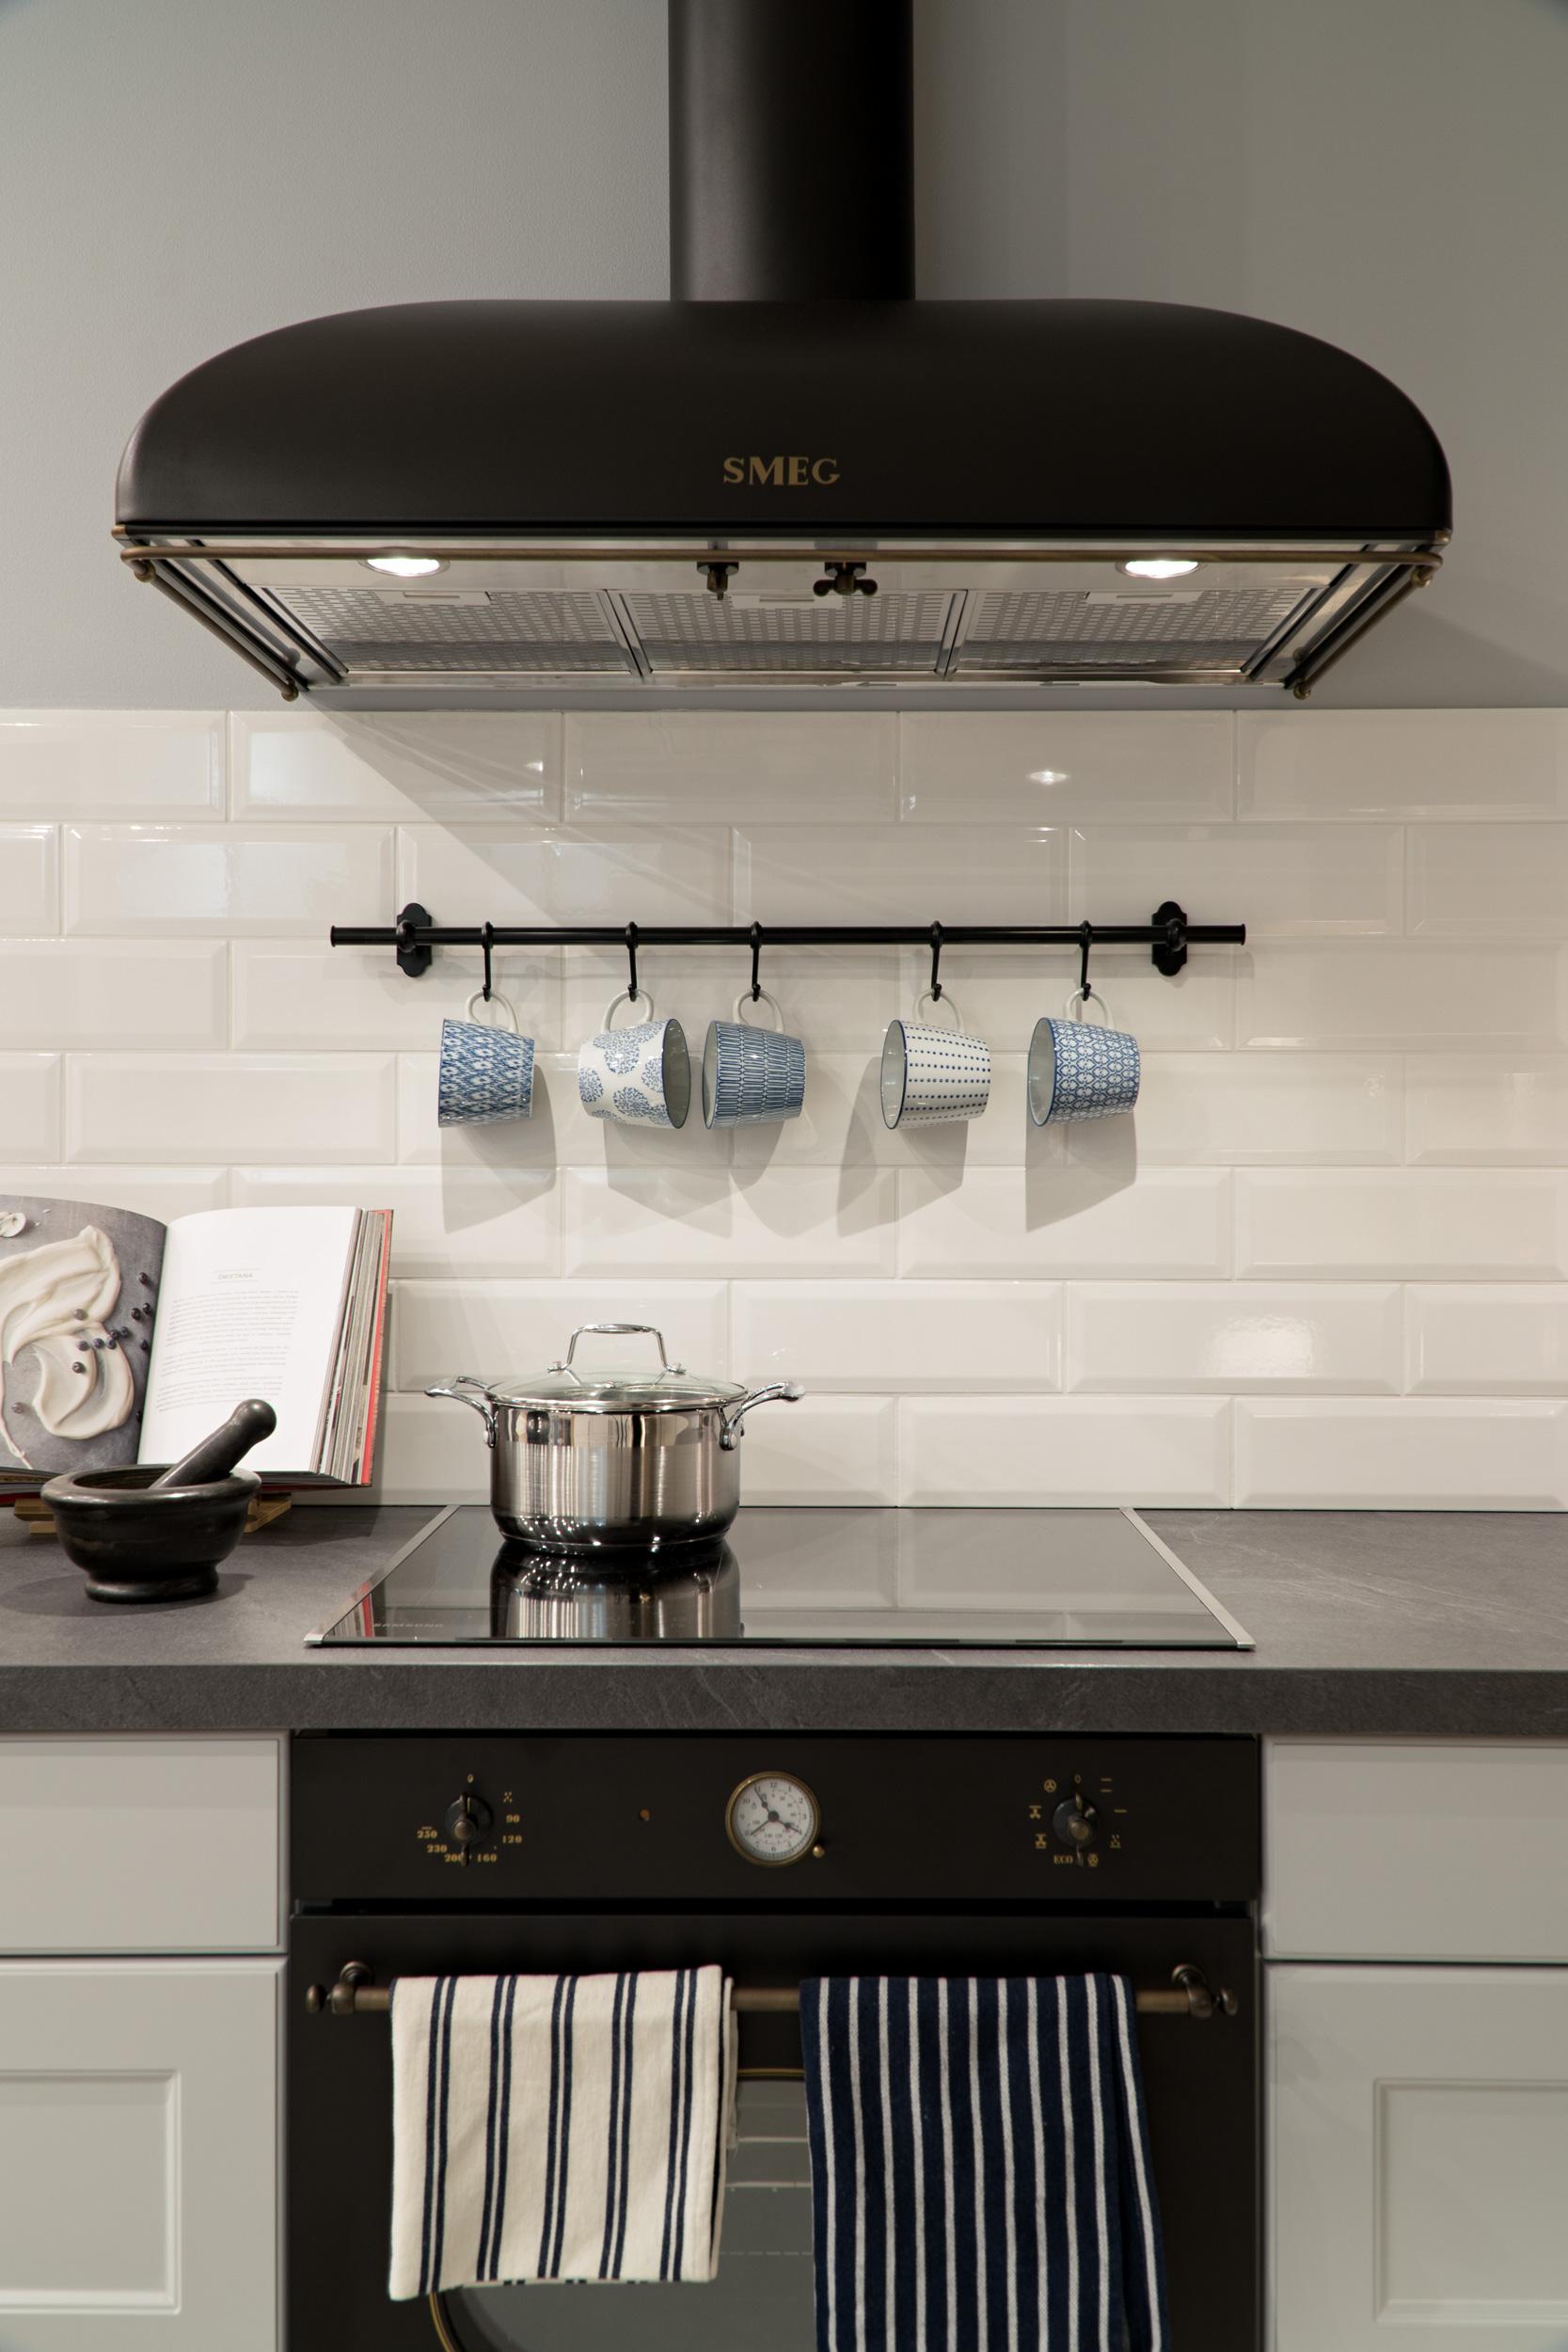 najlepsze meble kuchenne do kuchni meble kuchenne tarn243w